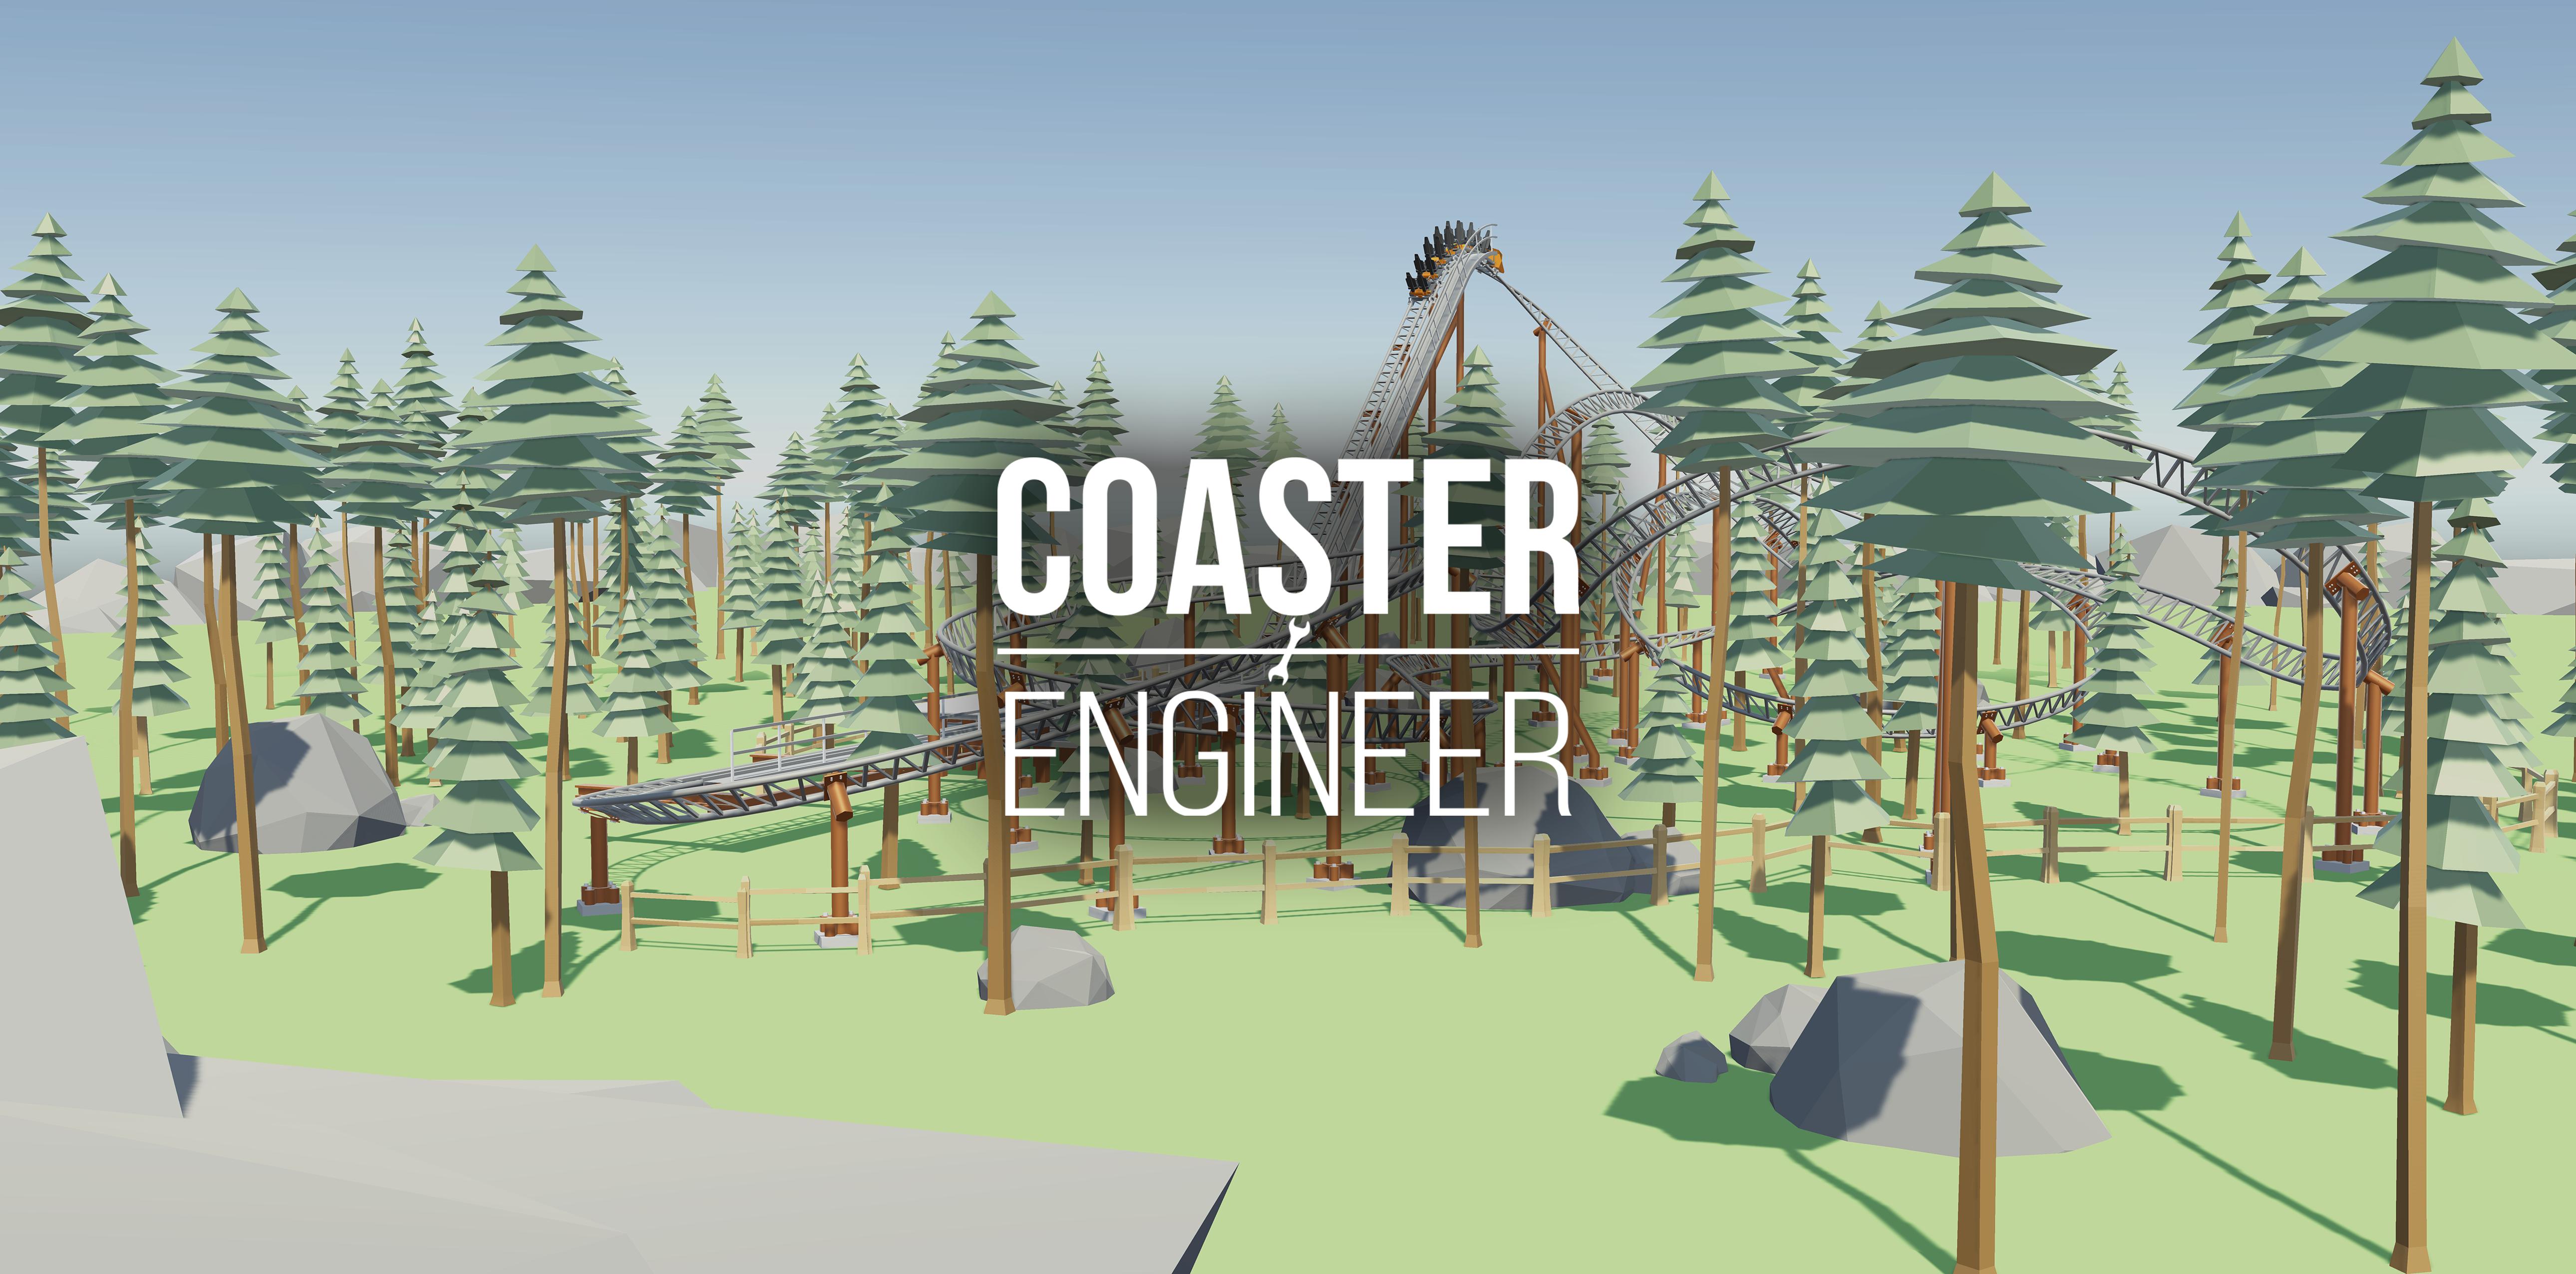 Coaster Engineer